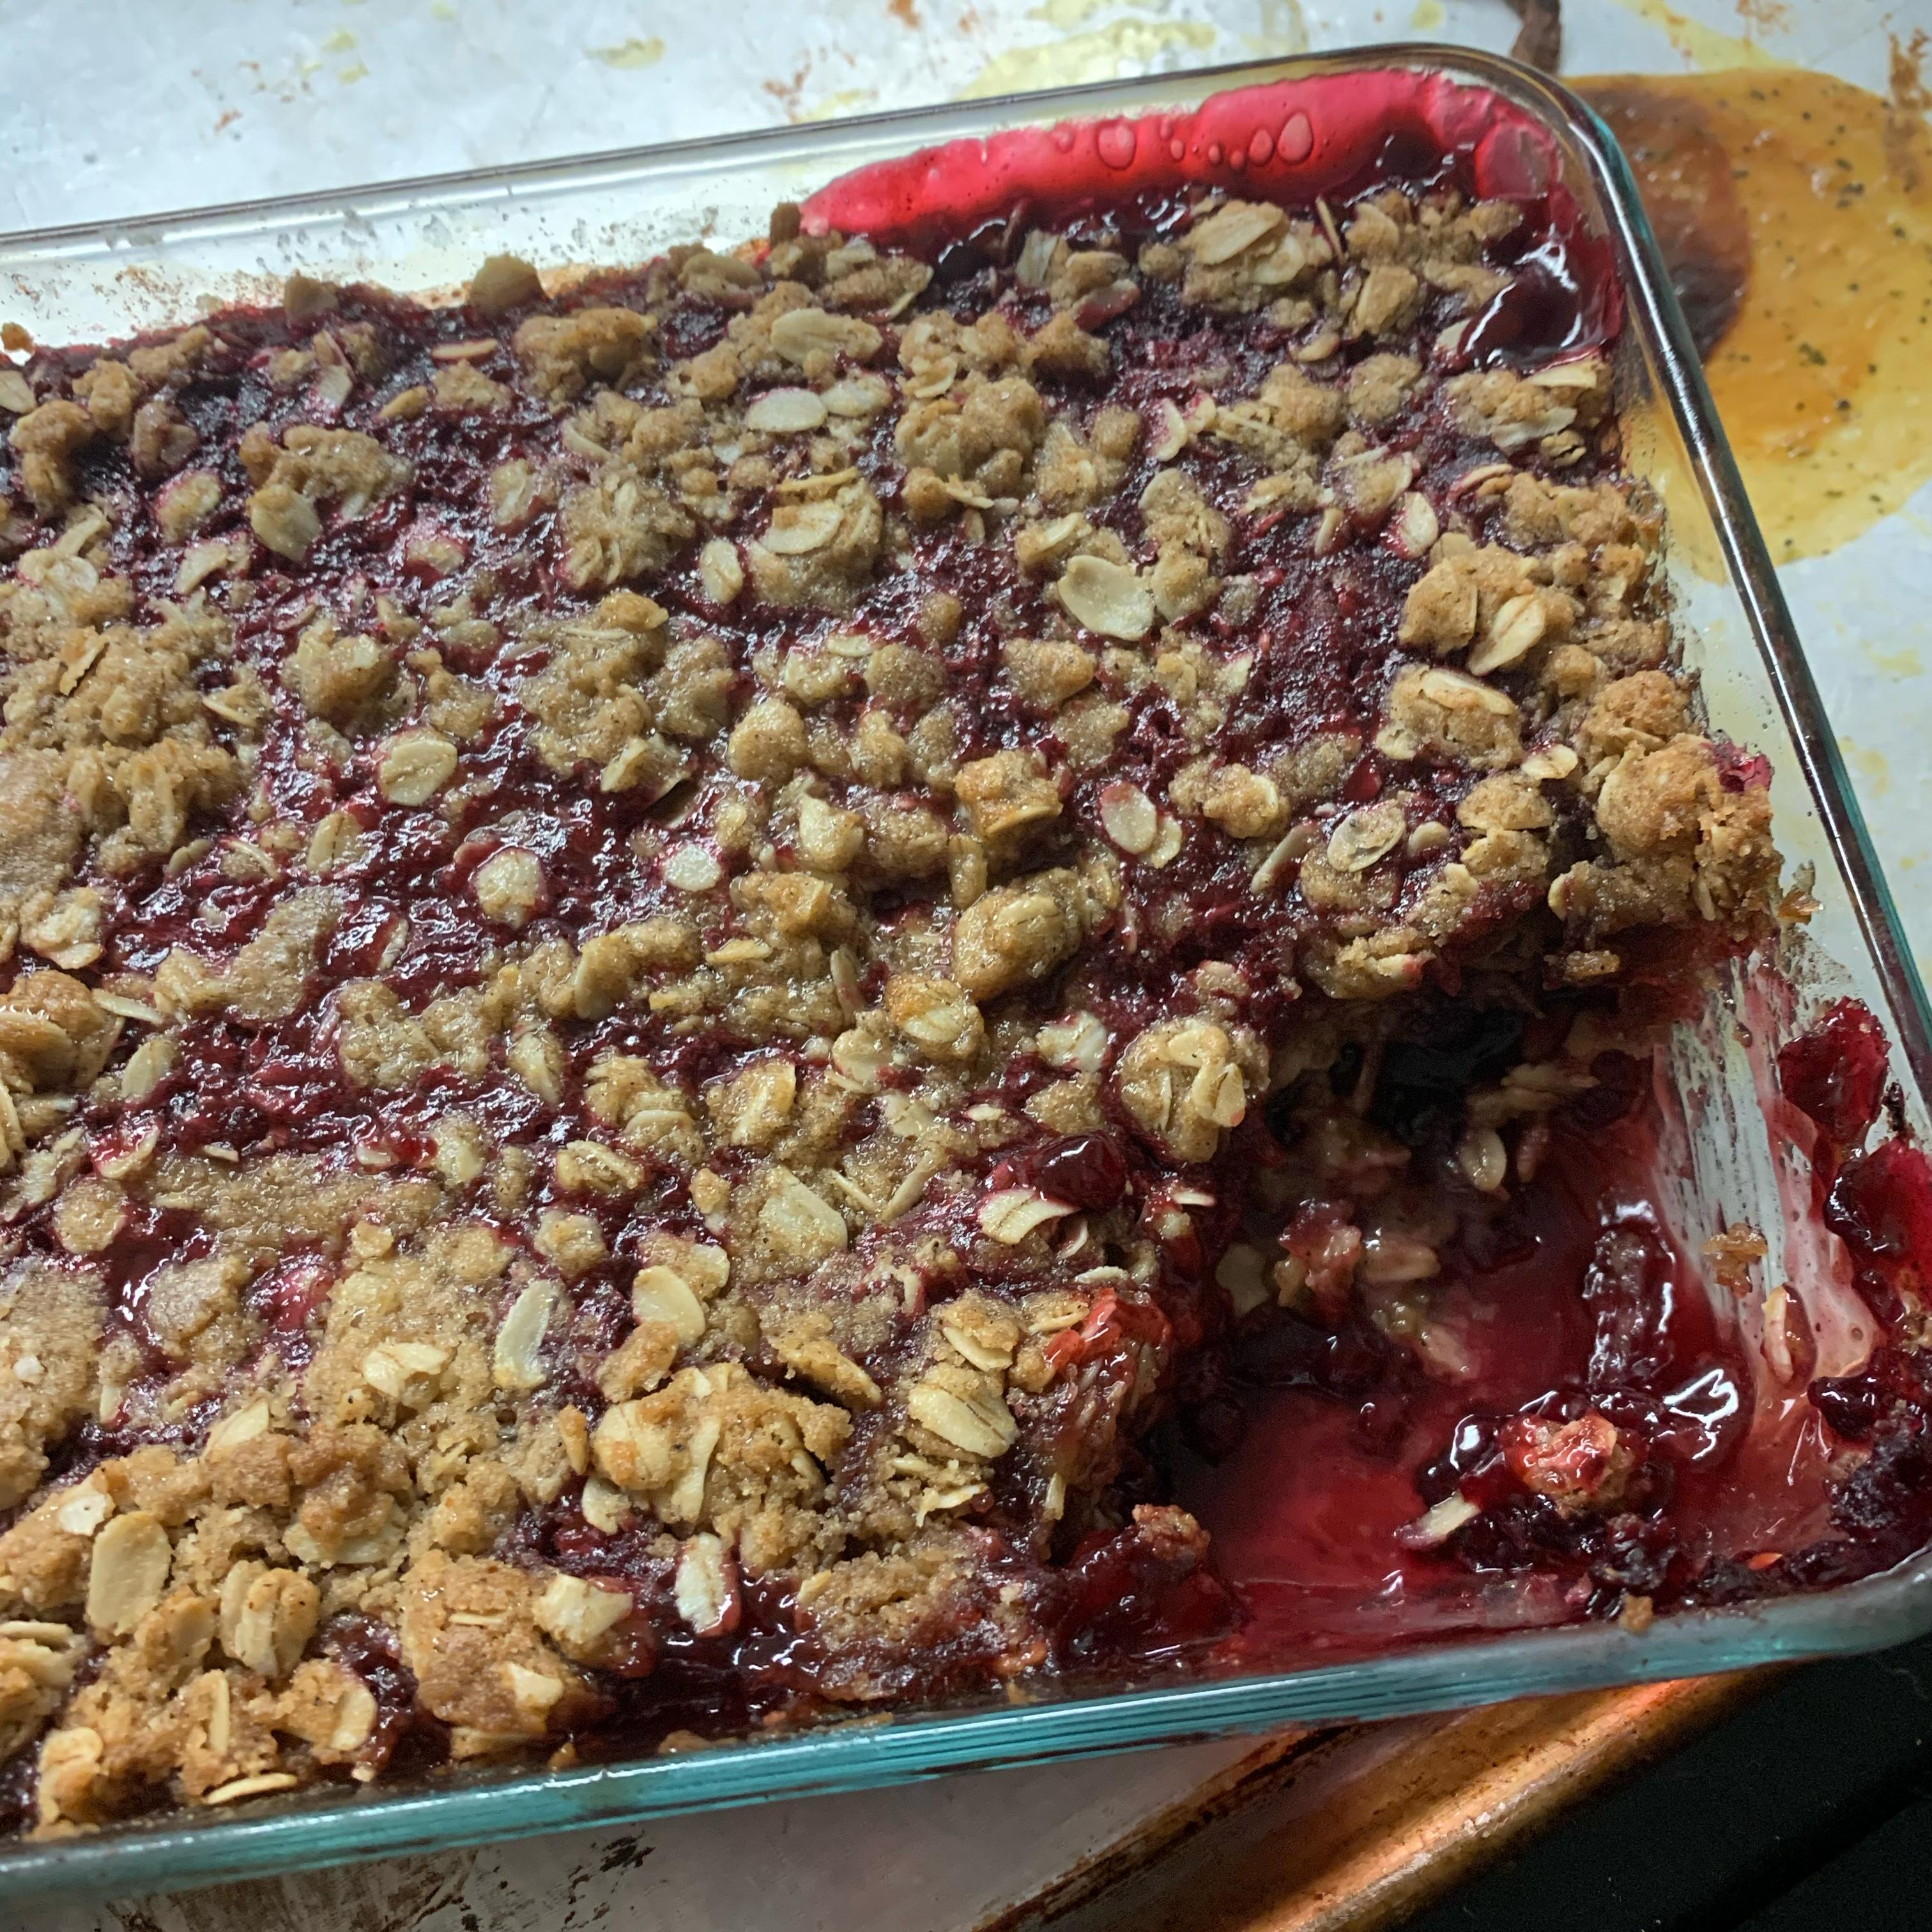 Huckleberry Crisp Anne Clack